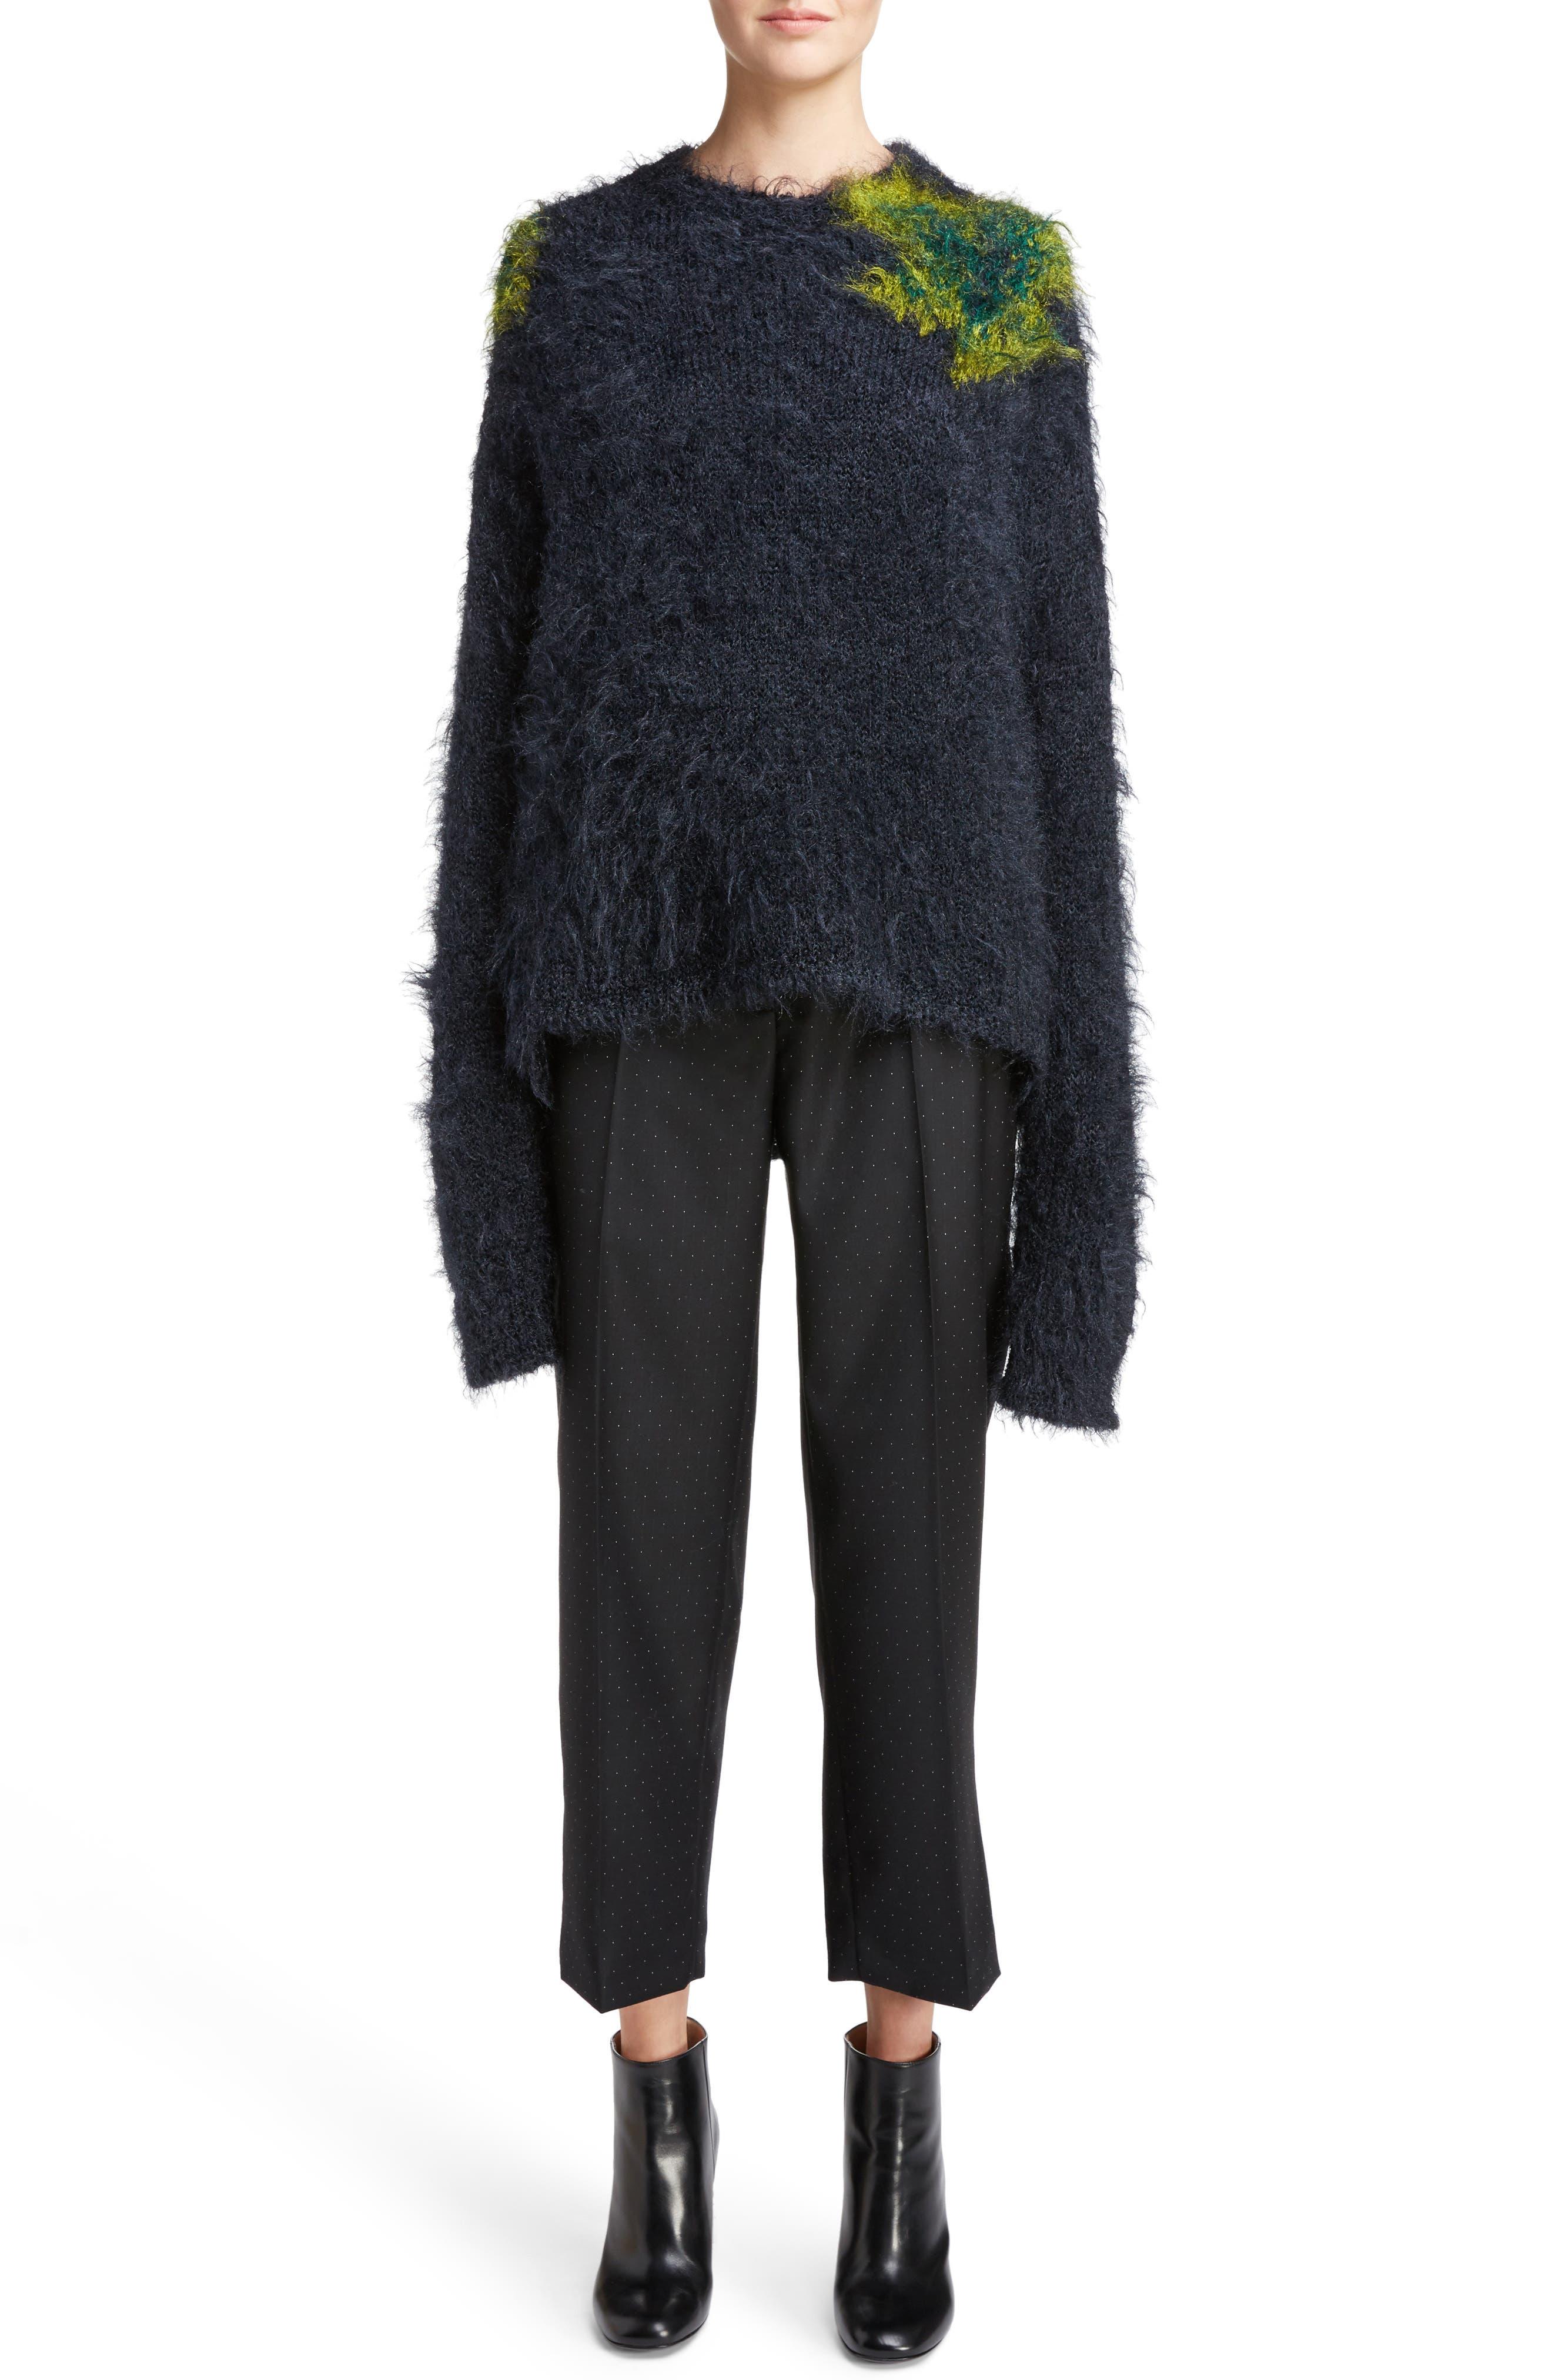 Main Image - ACNE Studios Fhira Hairy Oversize Sweater